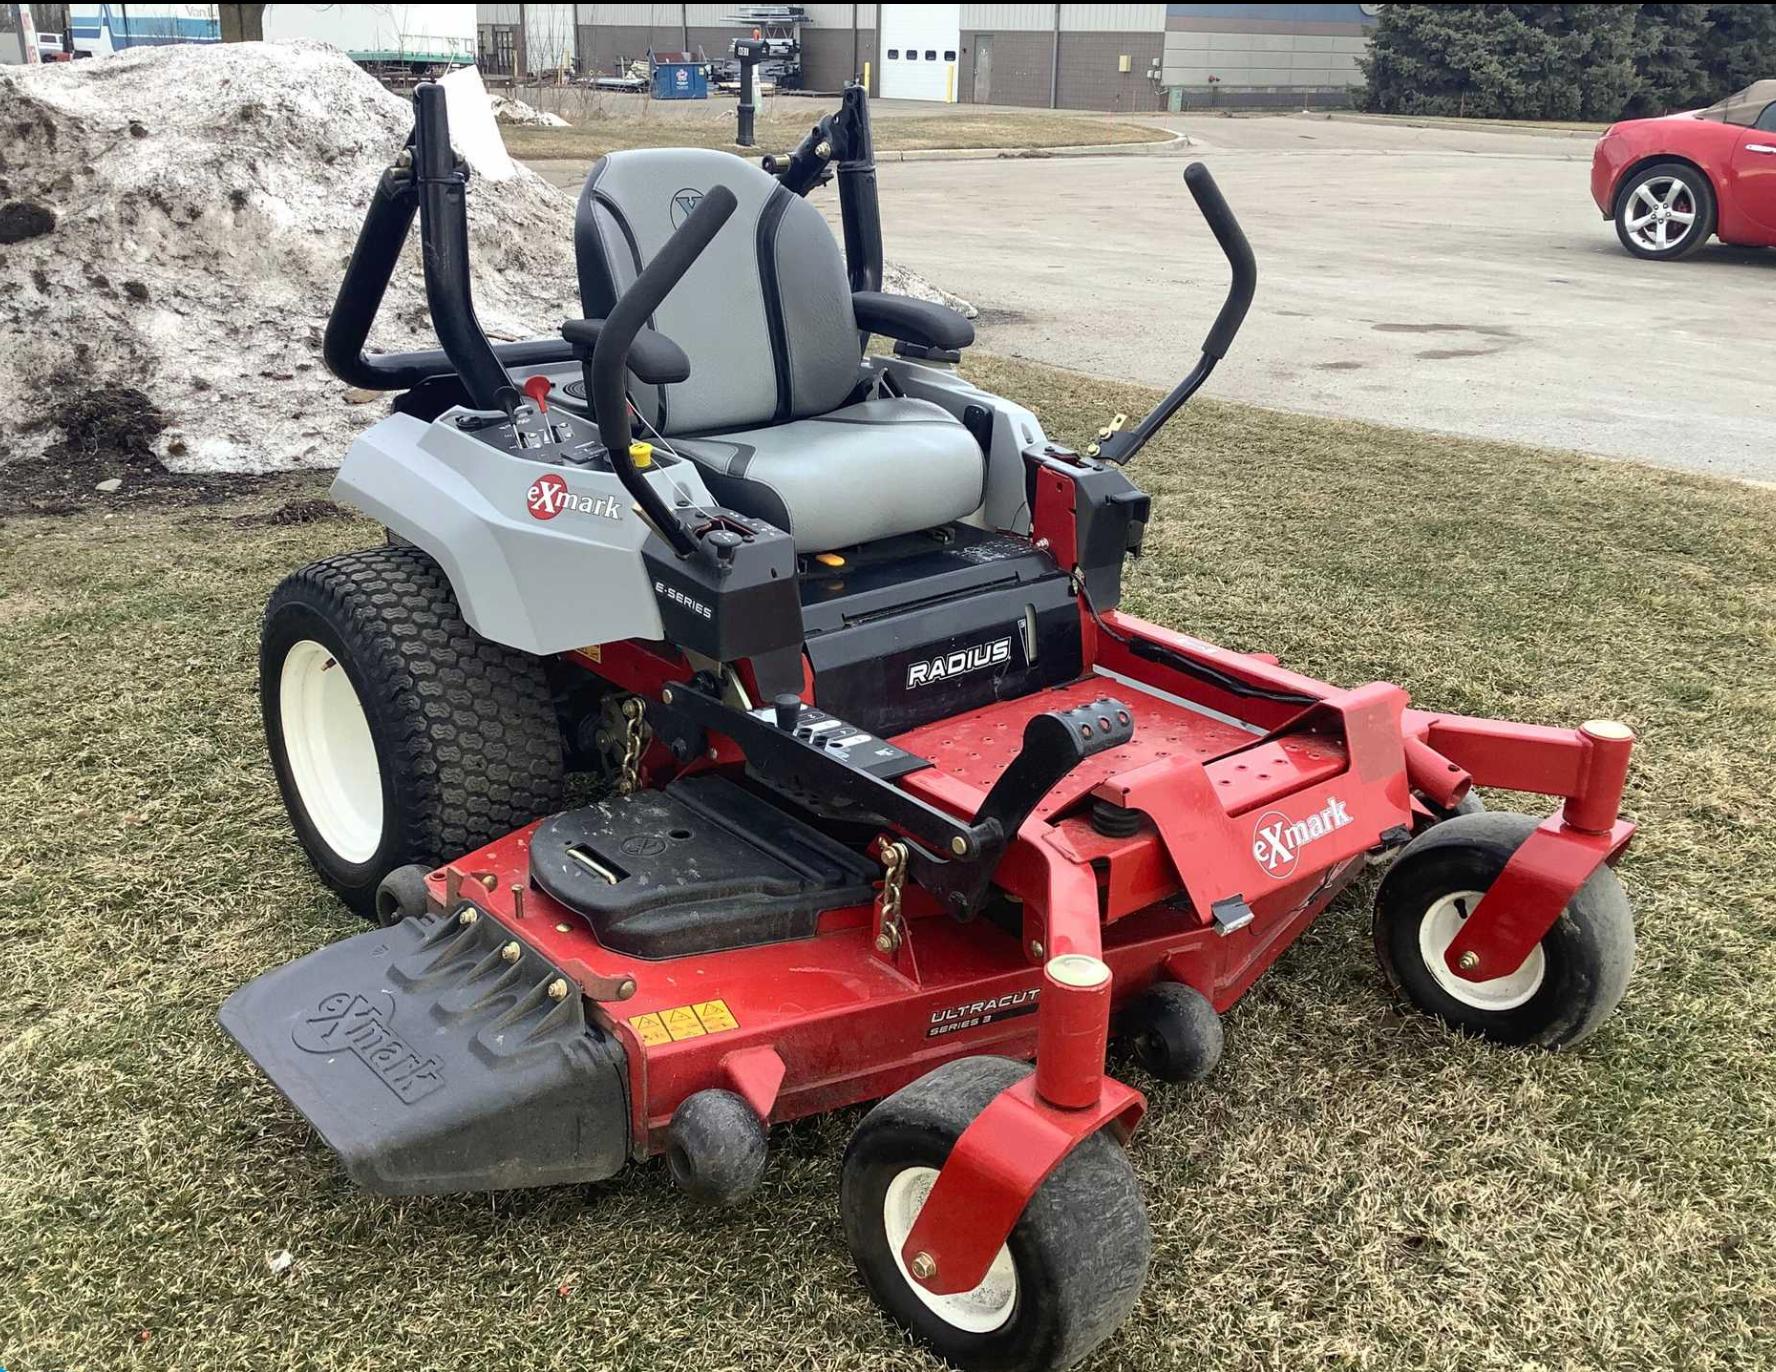 Exmark 2018 Zero Turn Lawn Mower